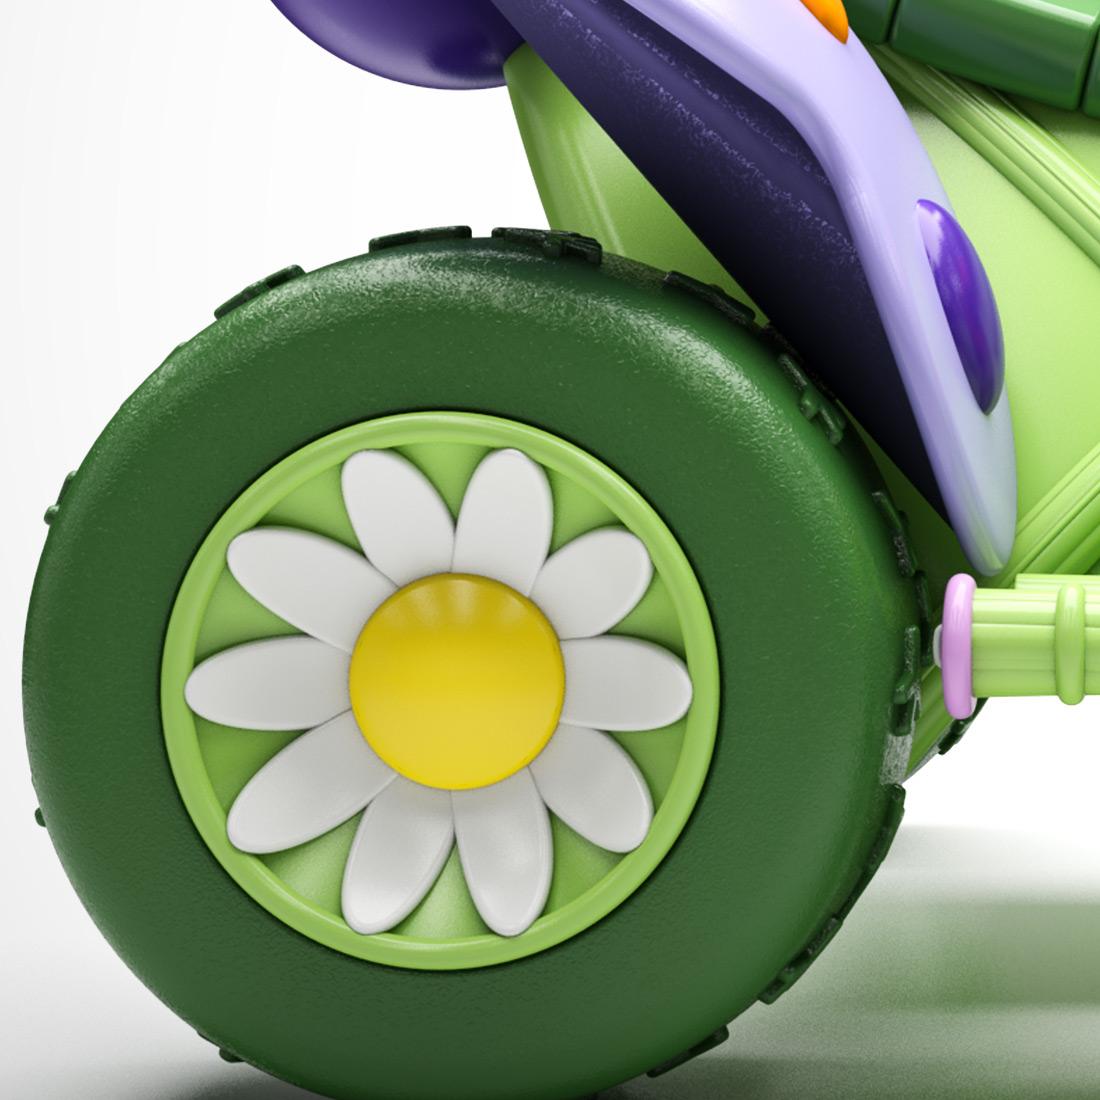 fairies quadbike